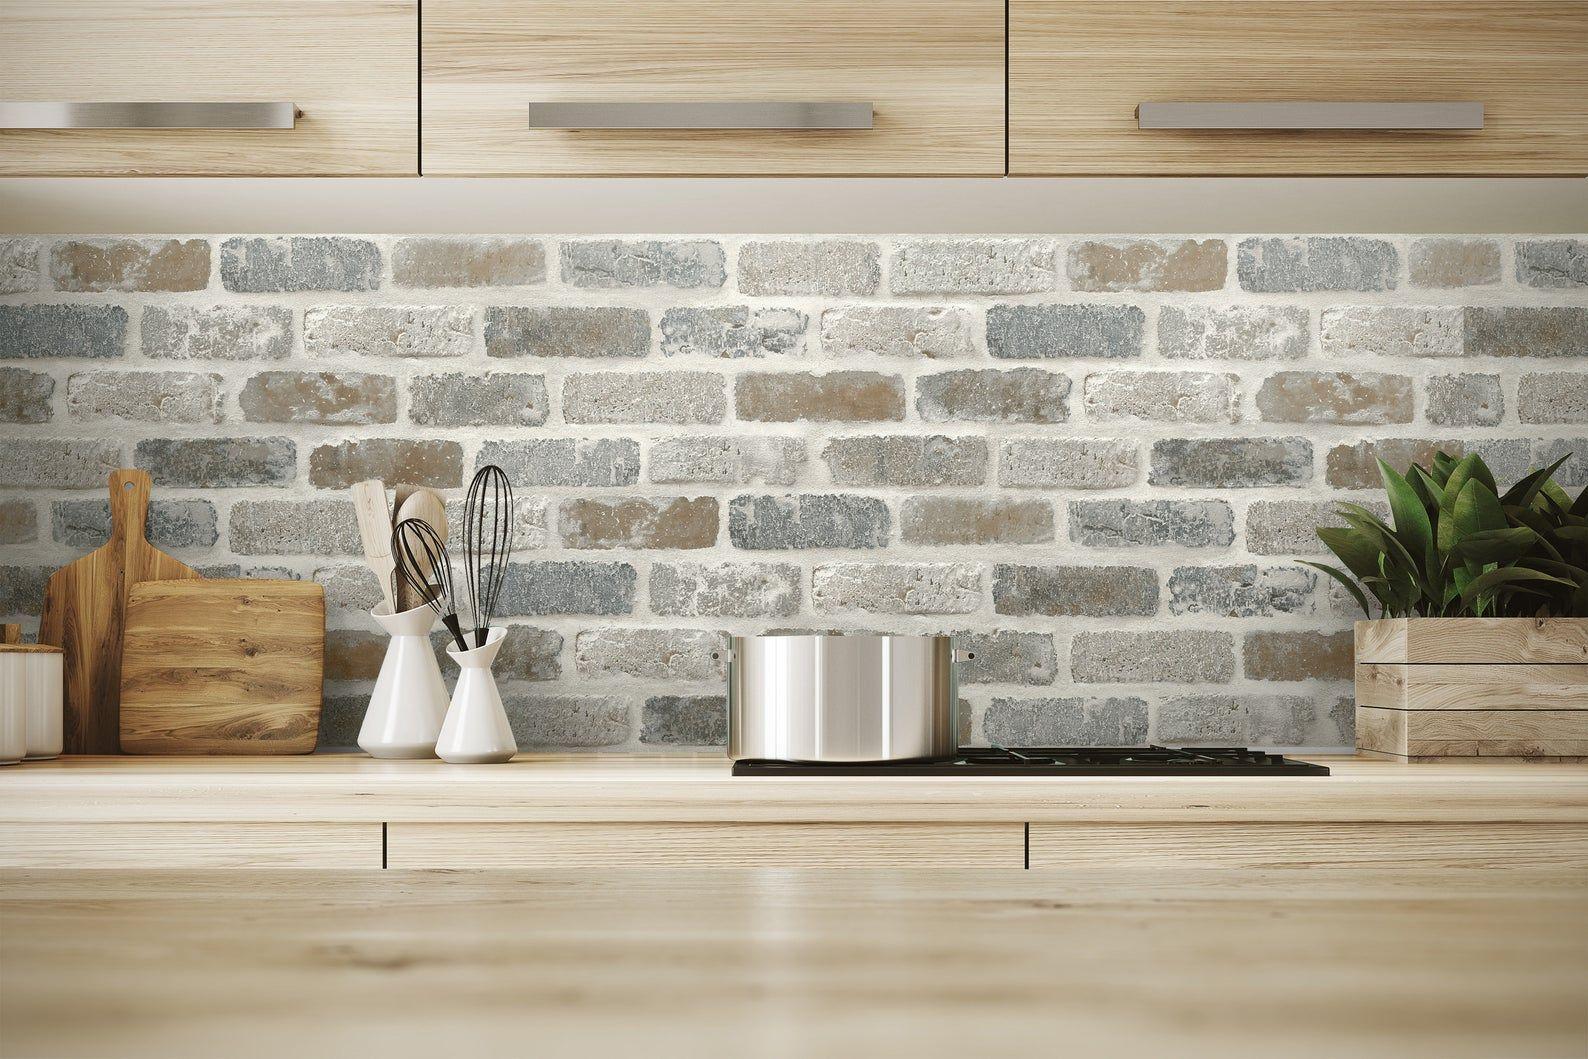 - Wallpaper Peel And Stick Brick Peel And Stick Wallpaper Peel